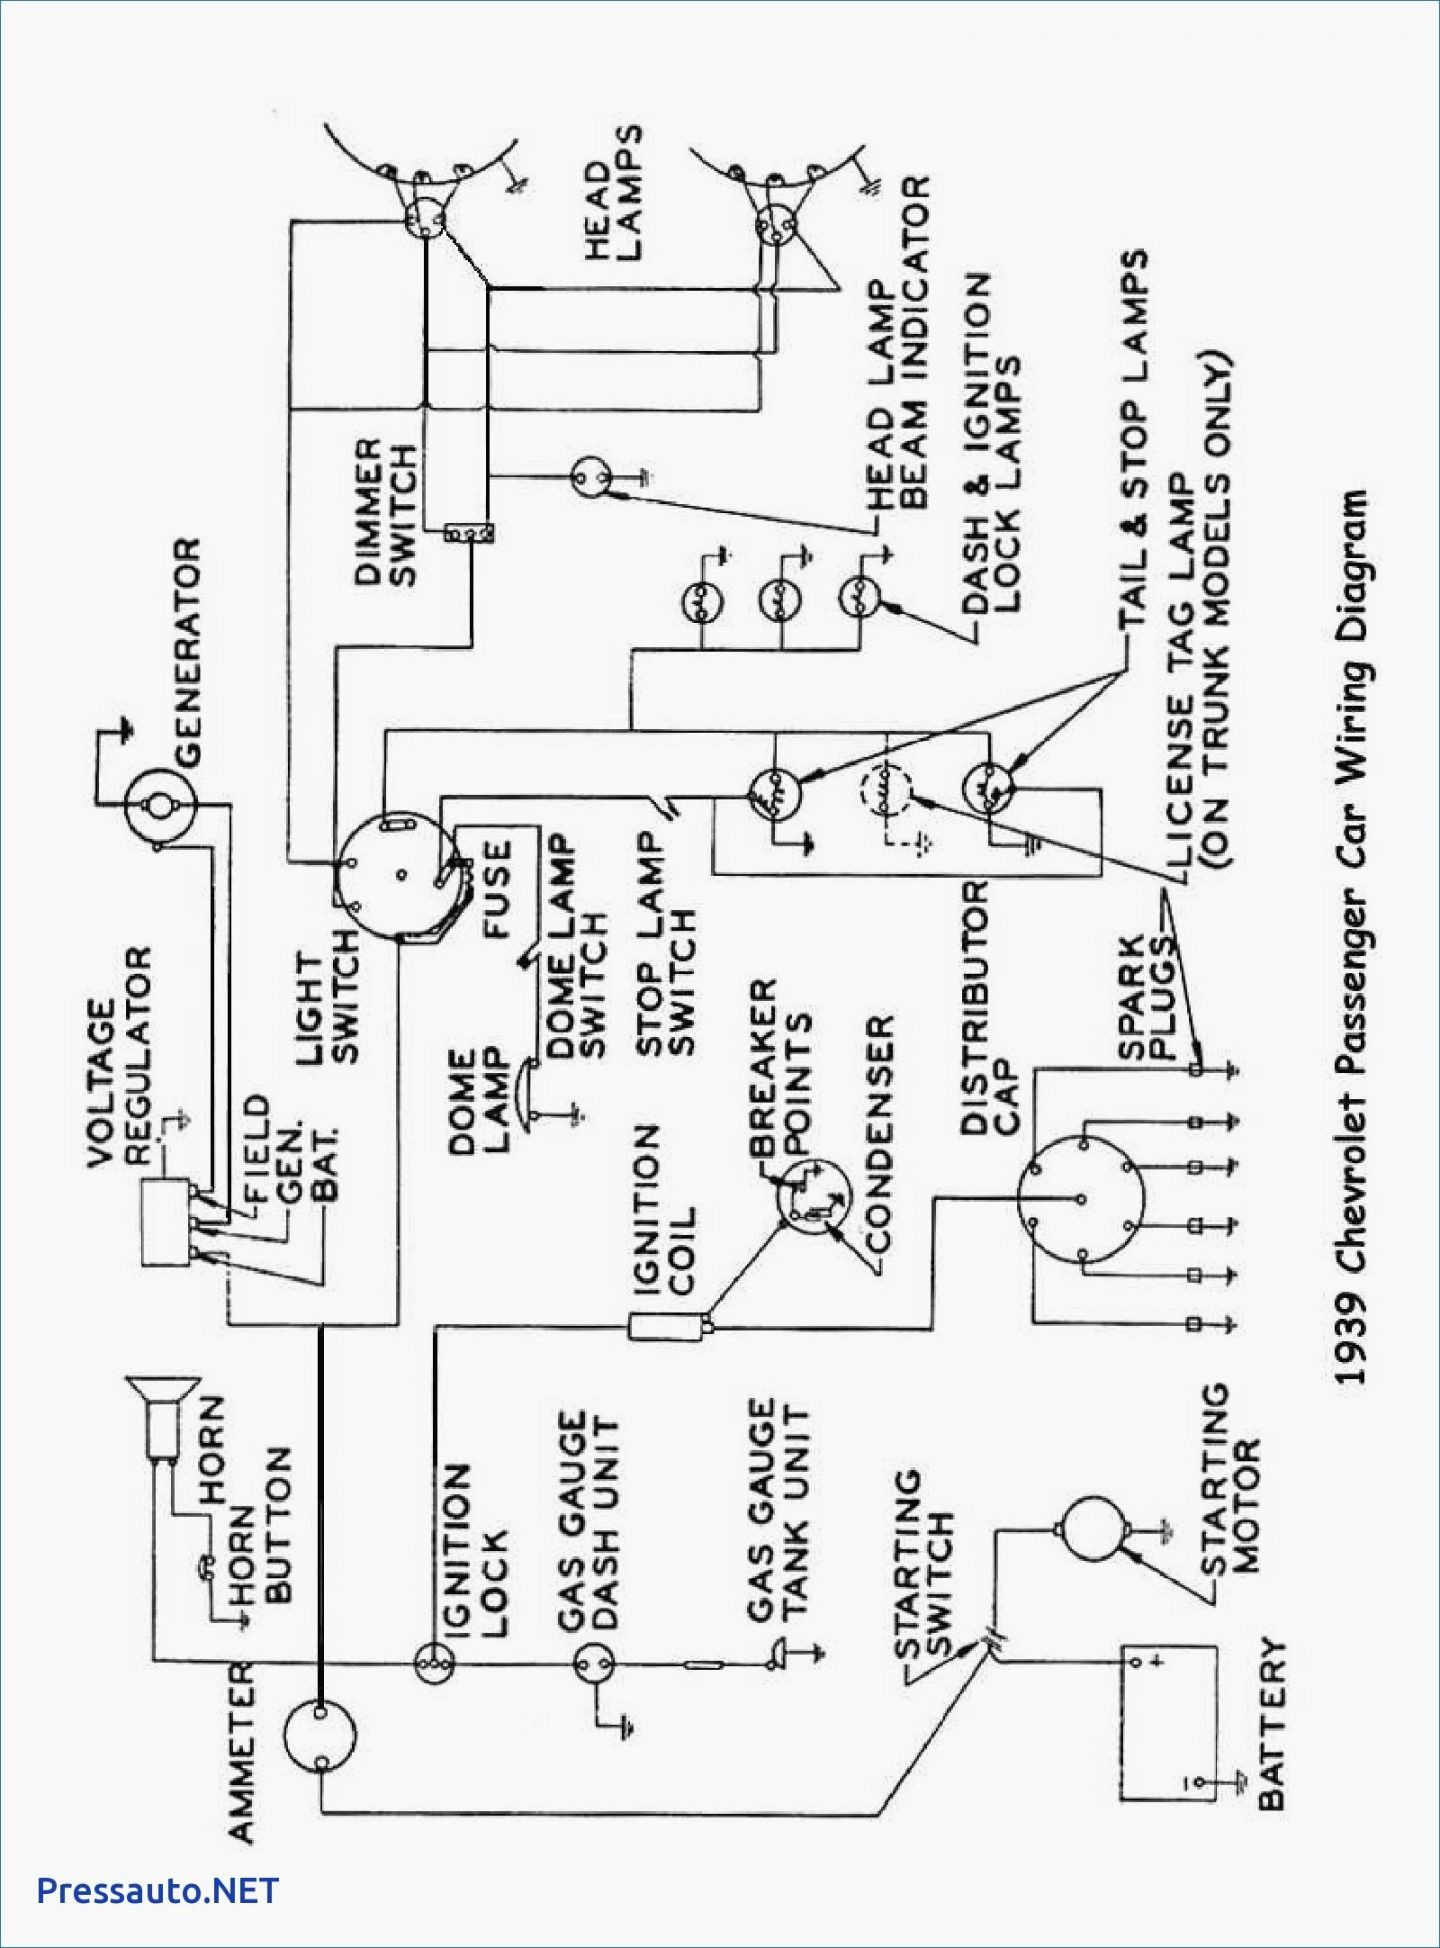 hight resolution of wiring diagram welding machine inspirationa best of pdf circuitwiring diagram welding machine inspirationa best of pdf